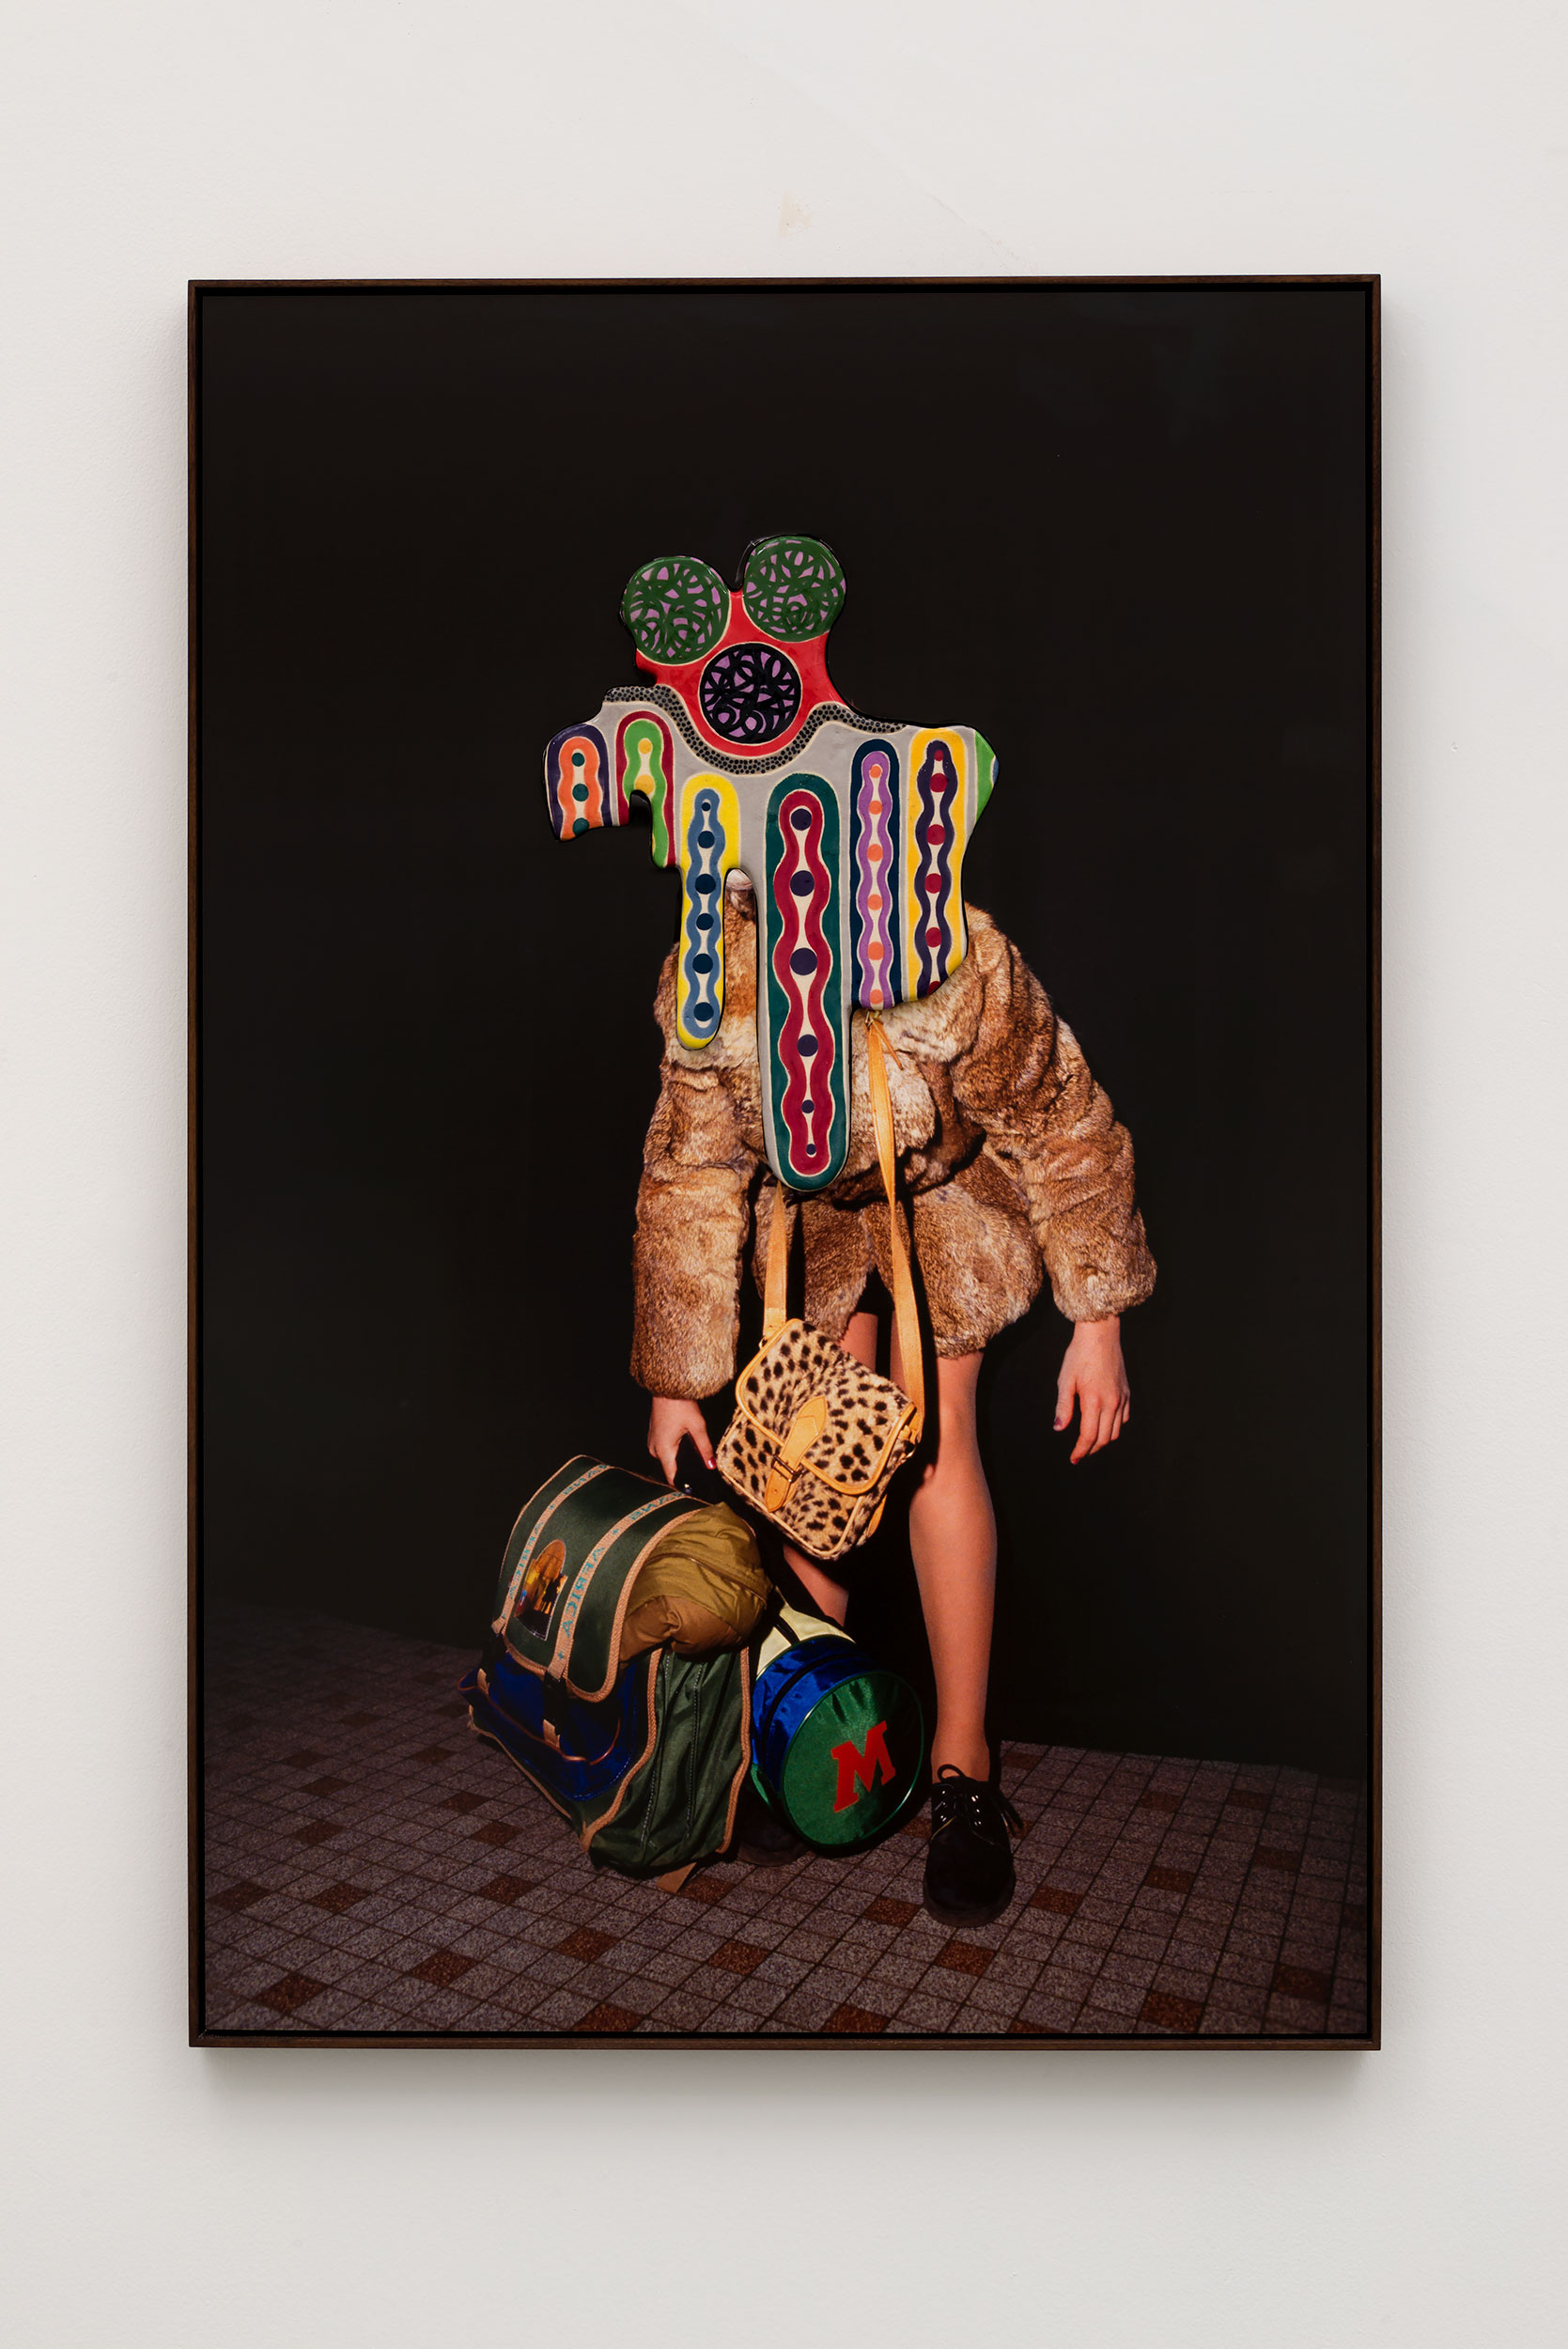 Denis Darzacq & Anna Lüneman,  Doublemix No. 50 , 2015  Digital pigment print with earthenware insert, 41.75 x 28 x 1.75 in (approx. 106 × 71 x 4 cm), unique   Inquire